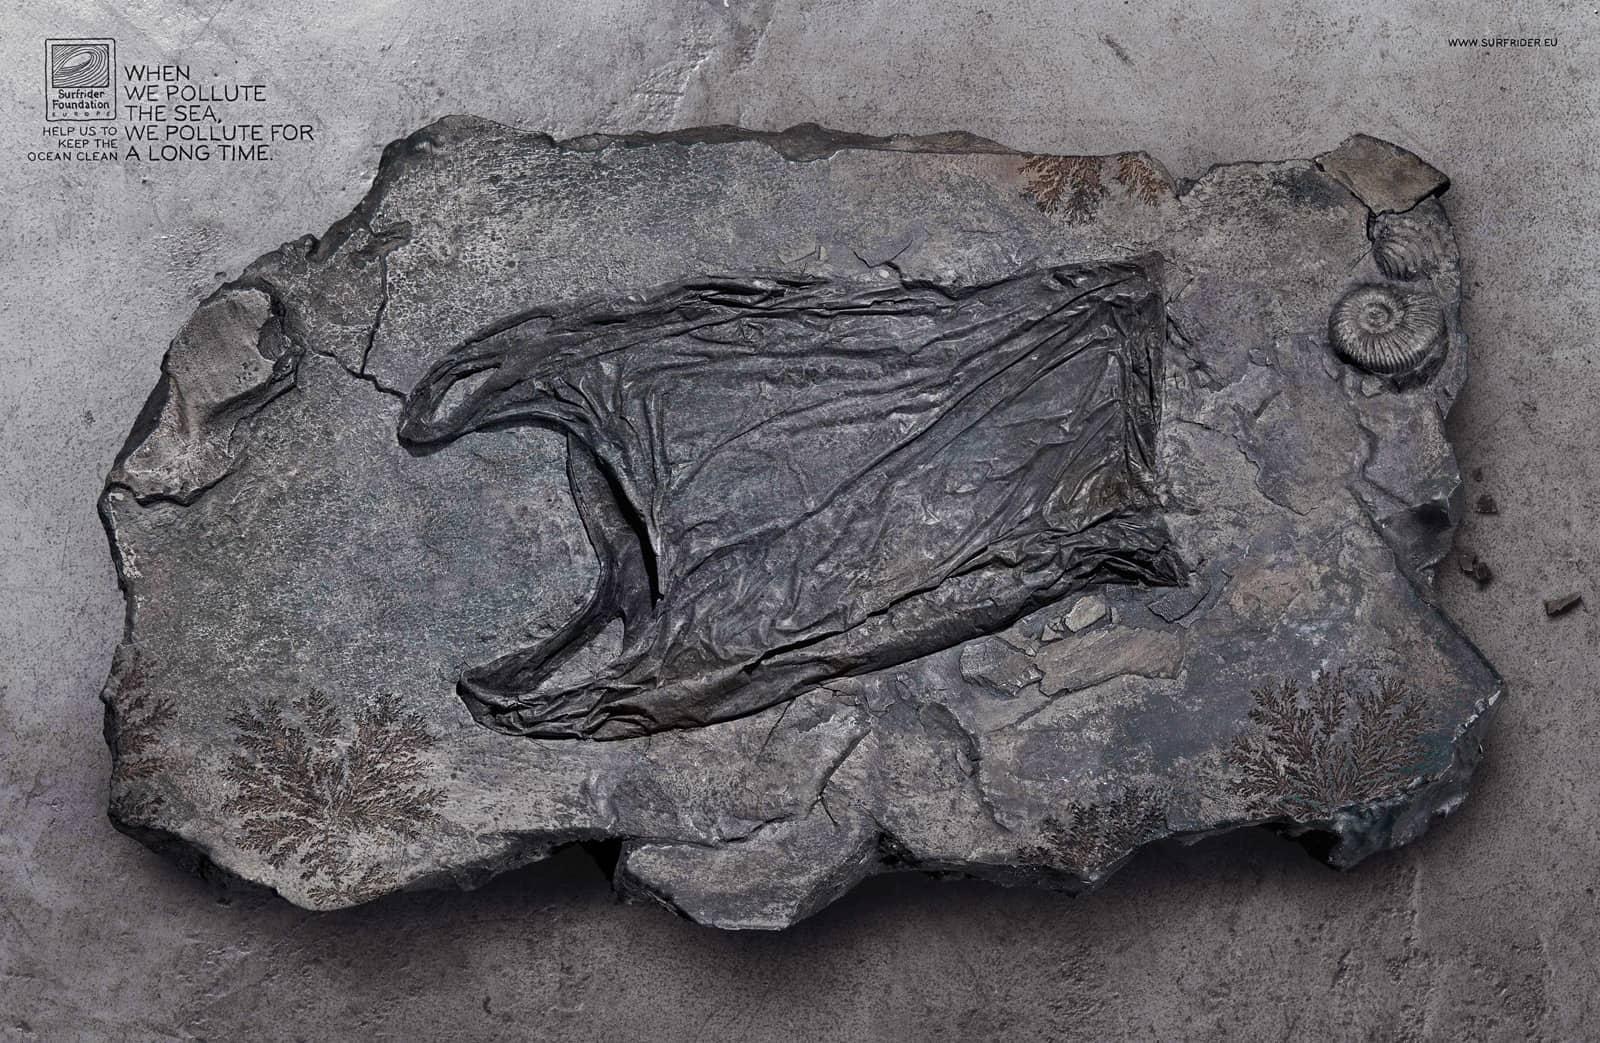 Surfrider Foundation : Sac fossilisé